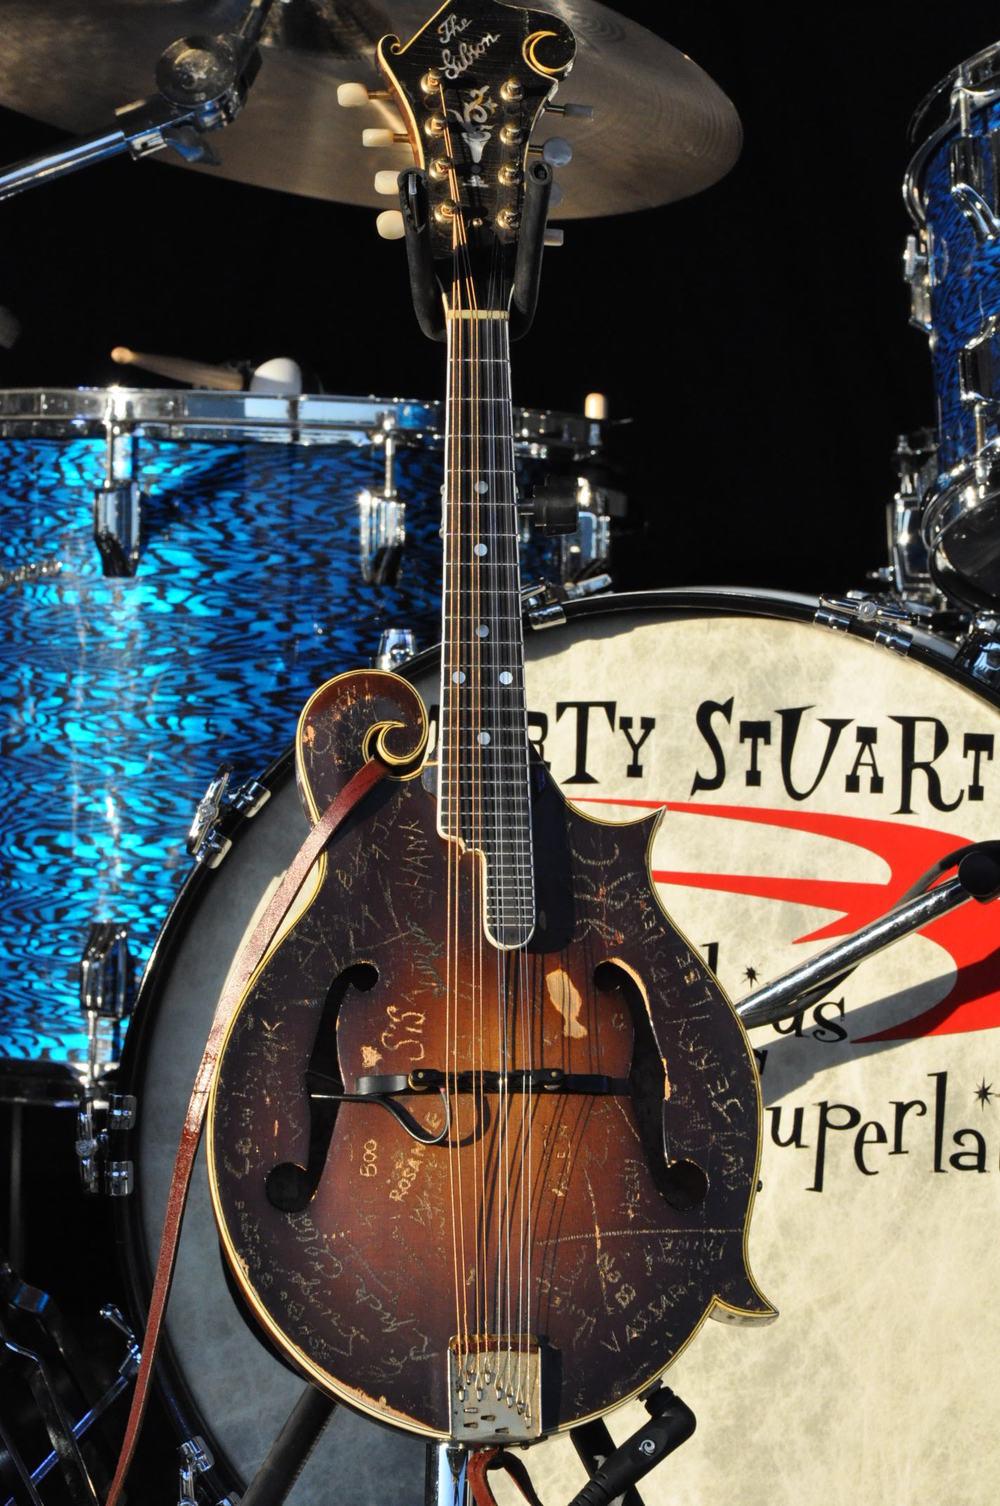 2011 - Marty Stuart's famous mandolin